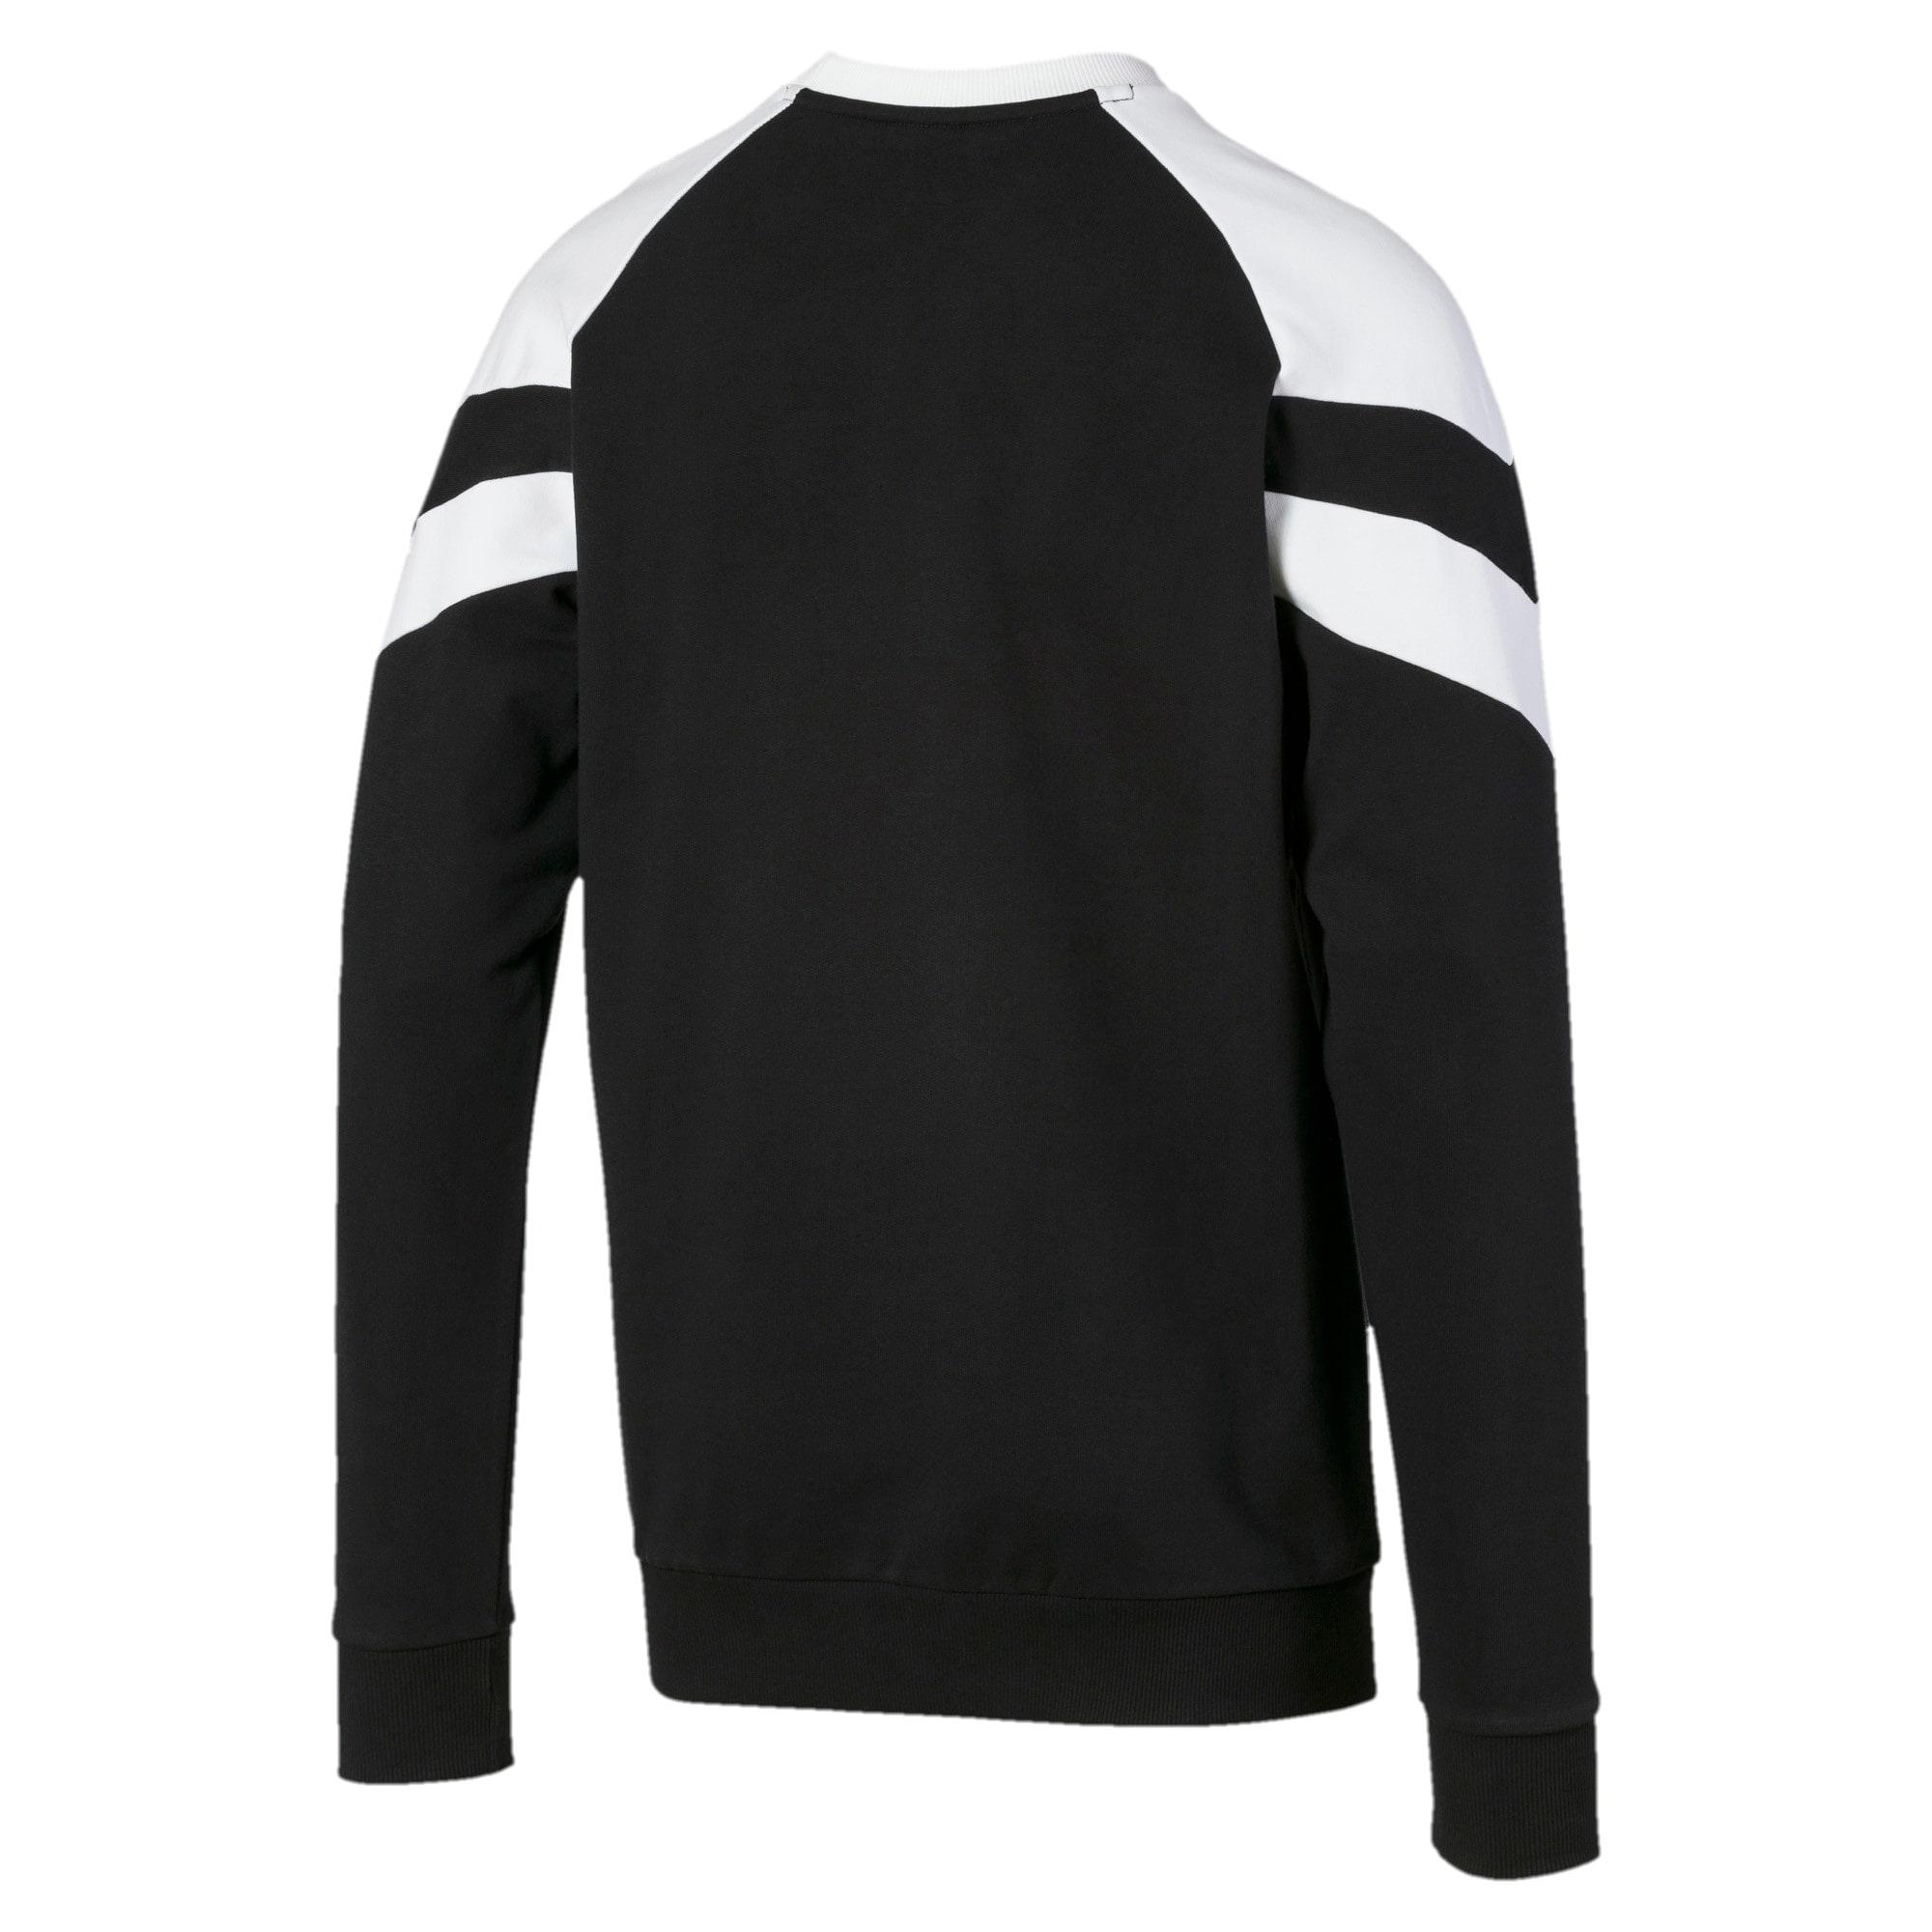 Thumbnail 5 of Iconic MCS Herren Sweatshirt, Puma Black, medium